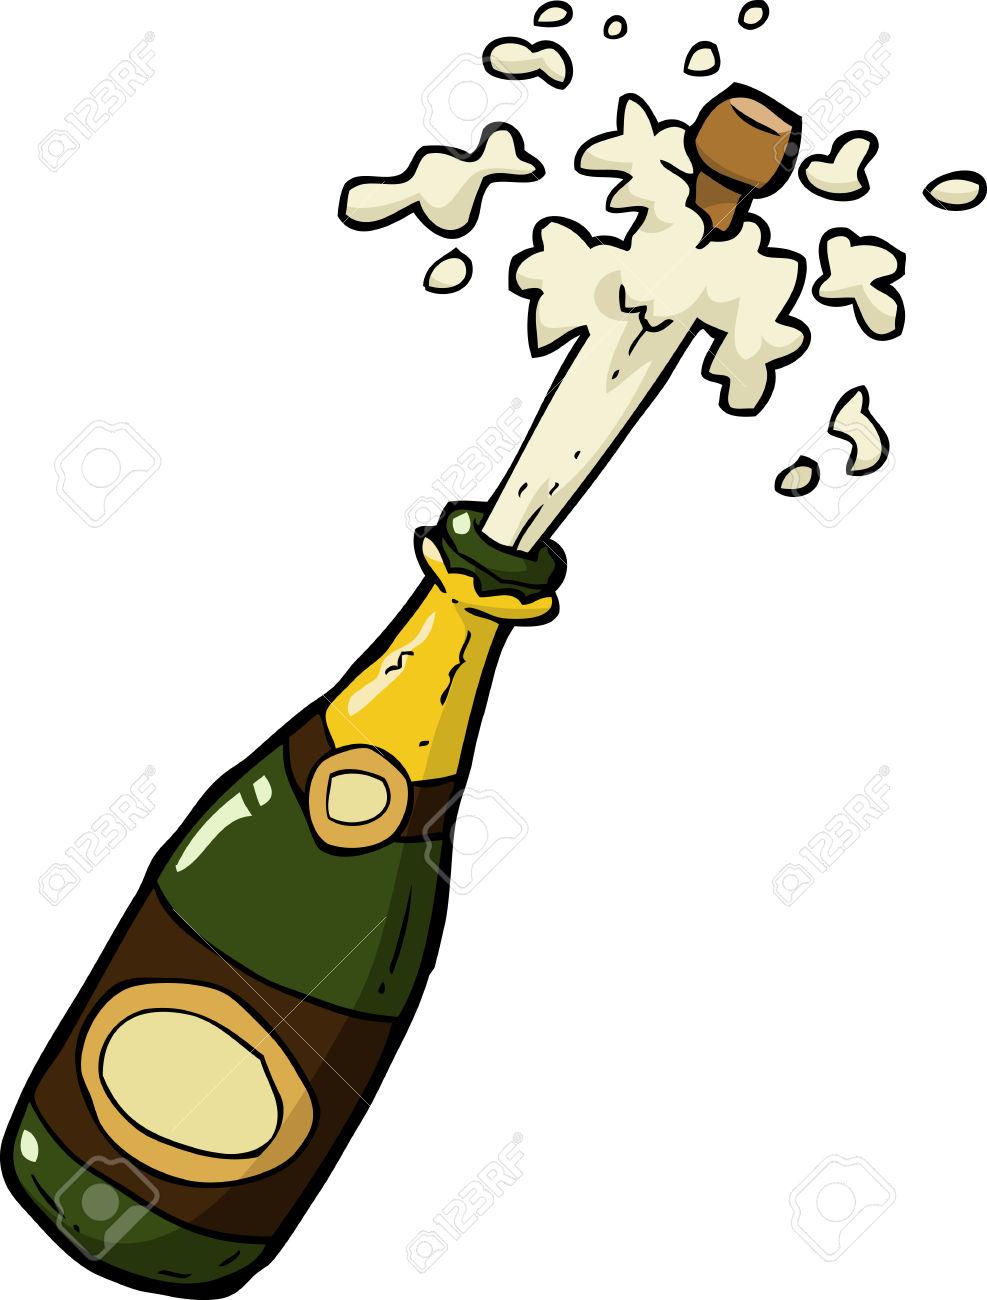 medium resolution of champagne bottle clipart free download jpg